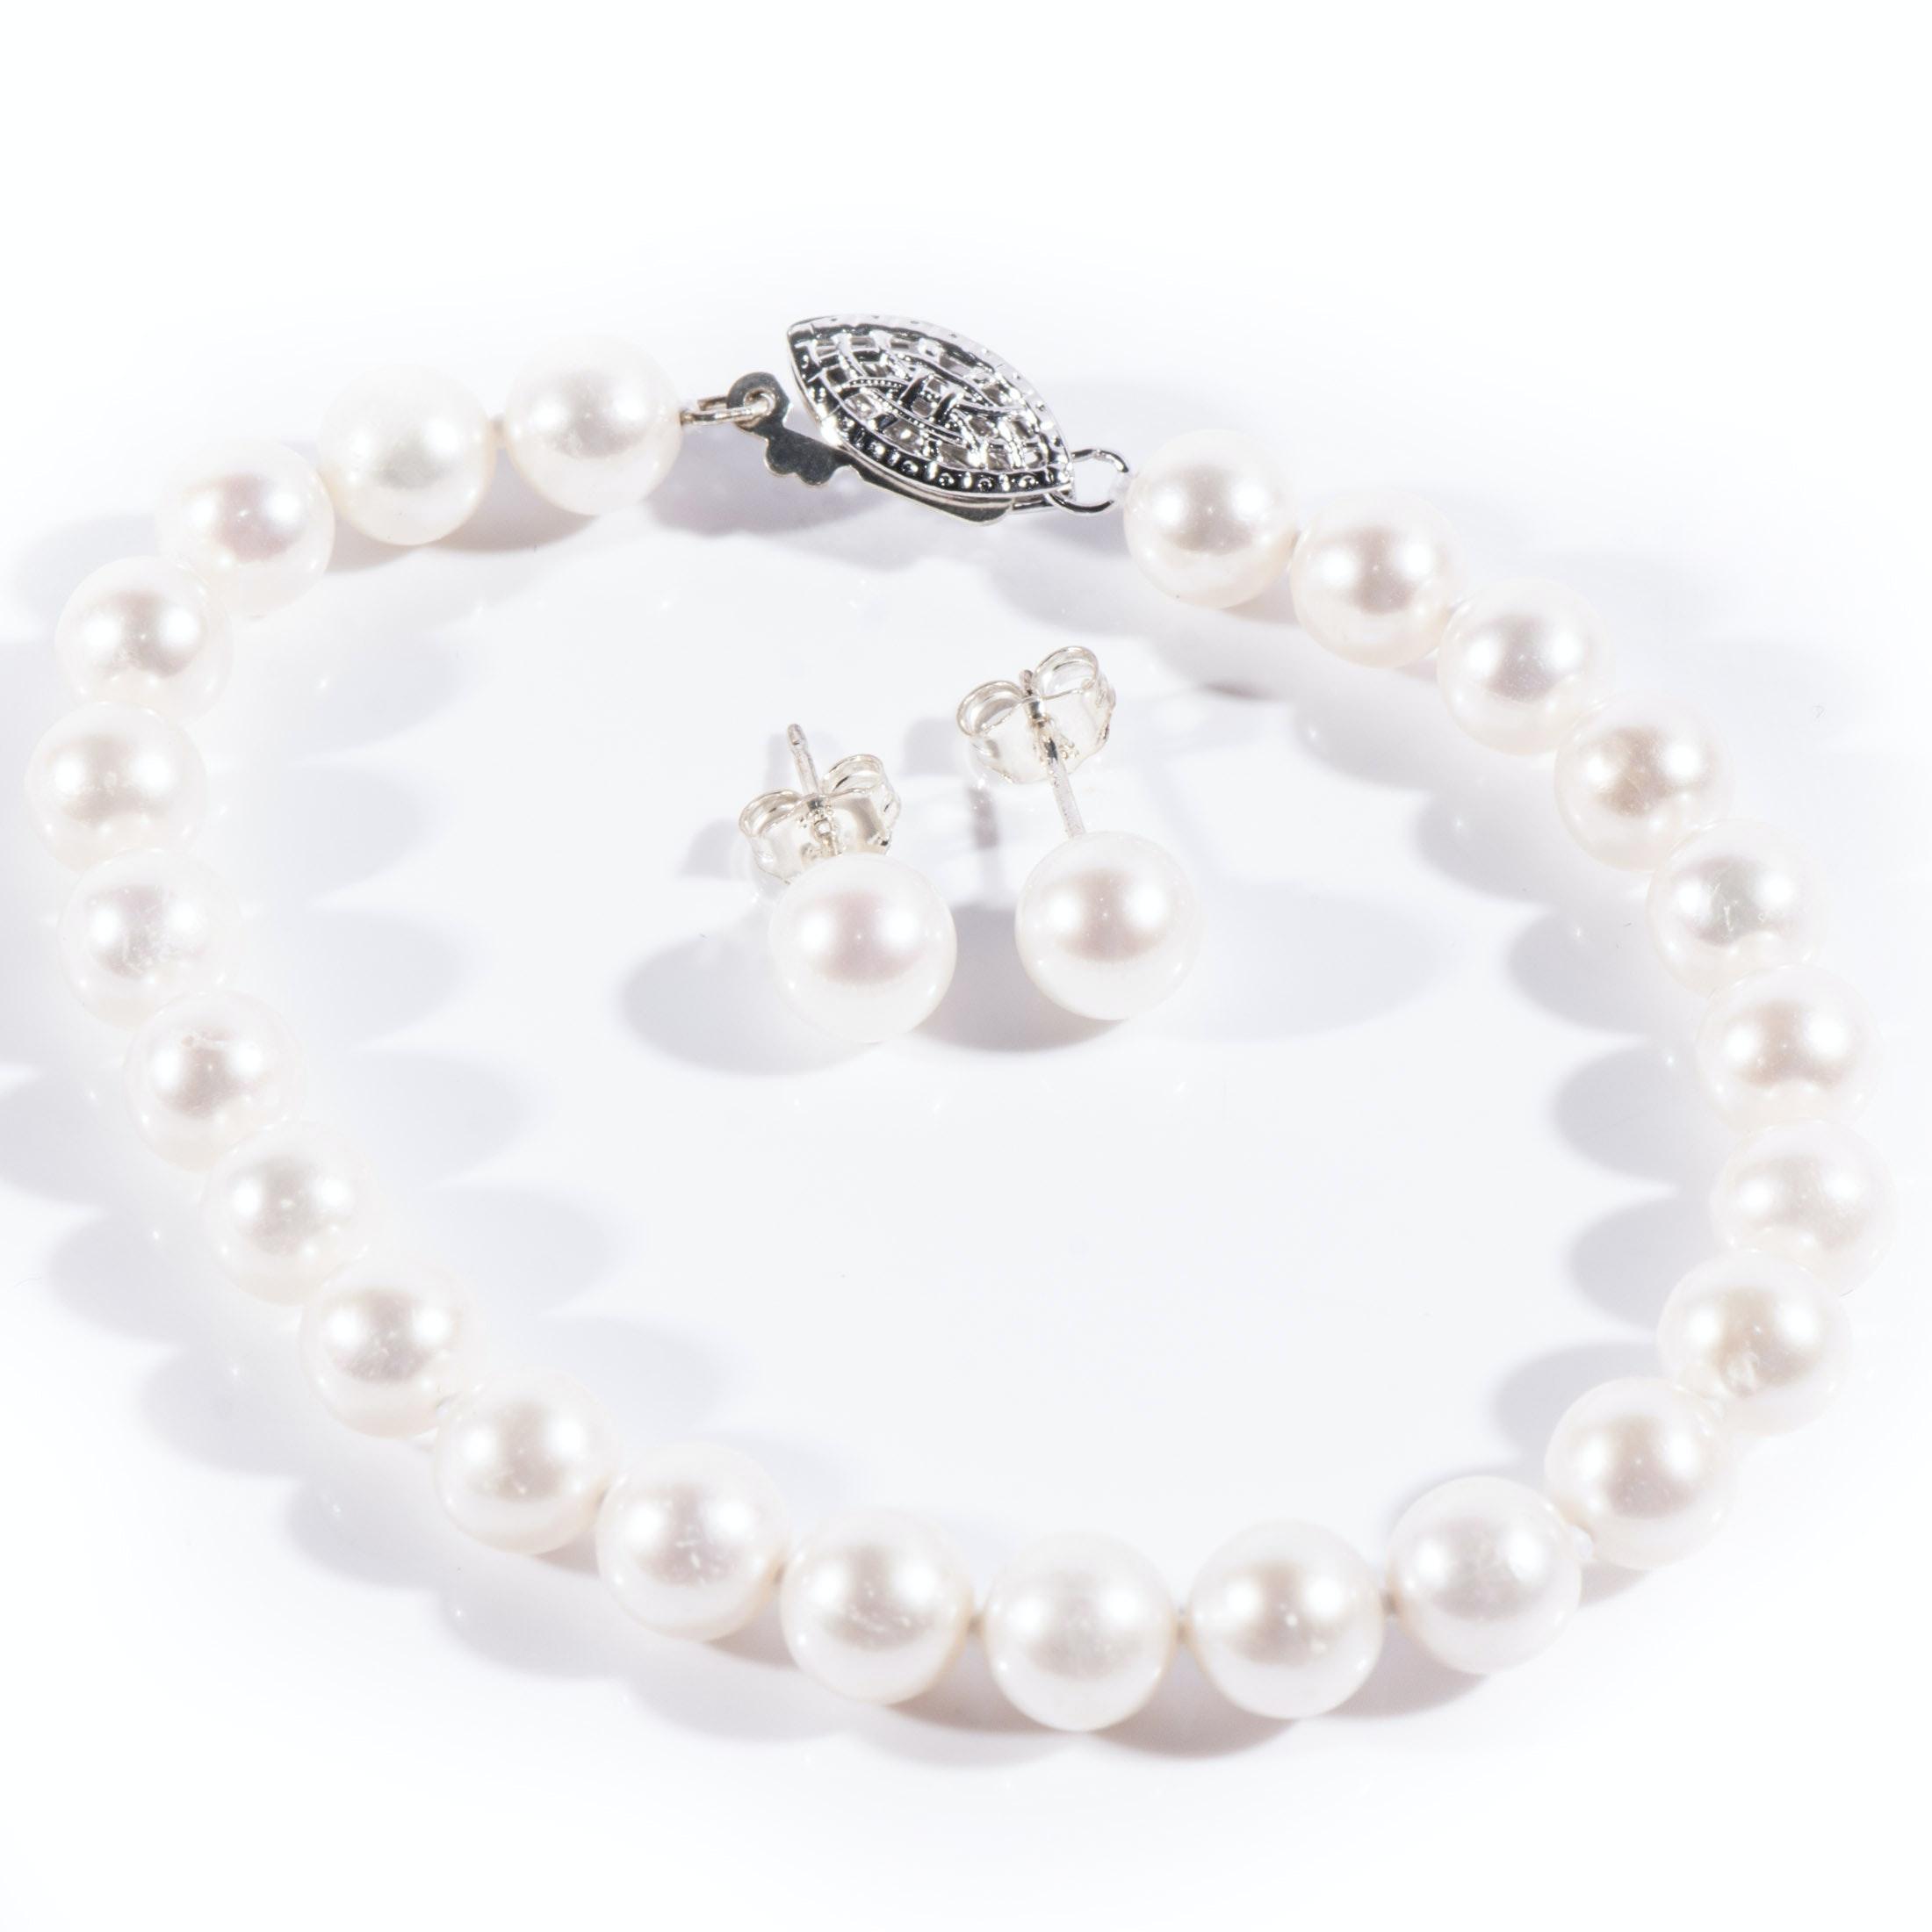 Cultured Pearl Bracelet and Pearl Stud Earrings